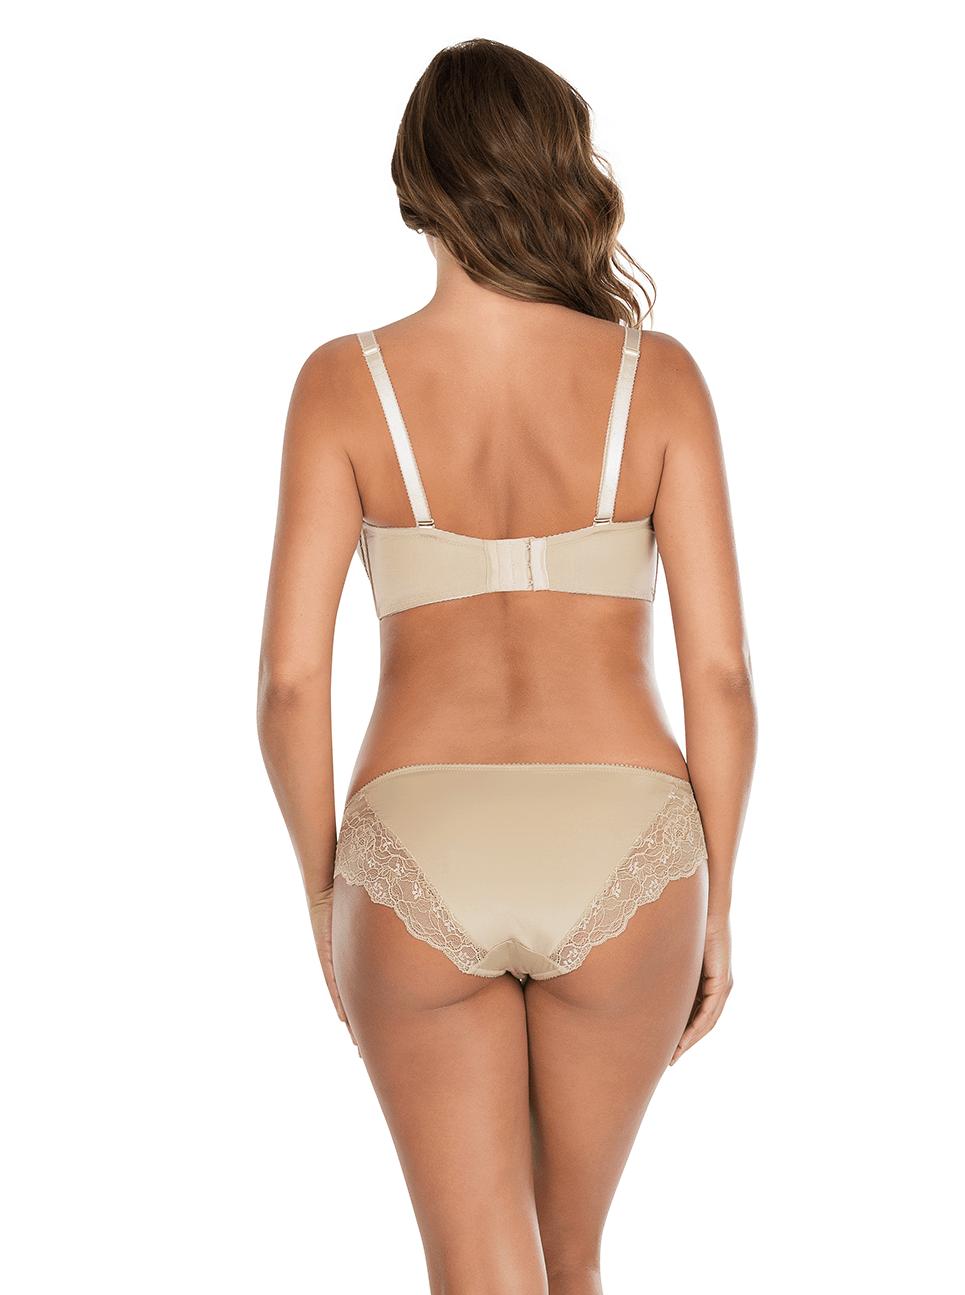 Elissa ContourUnderwireBraP5011 BikiniP5013 ENude Back - Elissa Bikini - European Nude - P5013